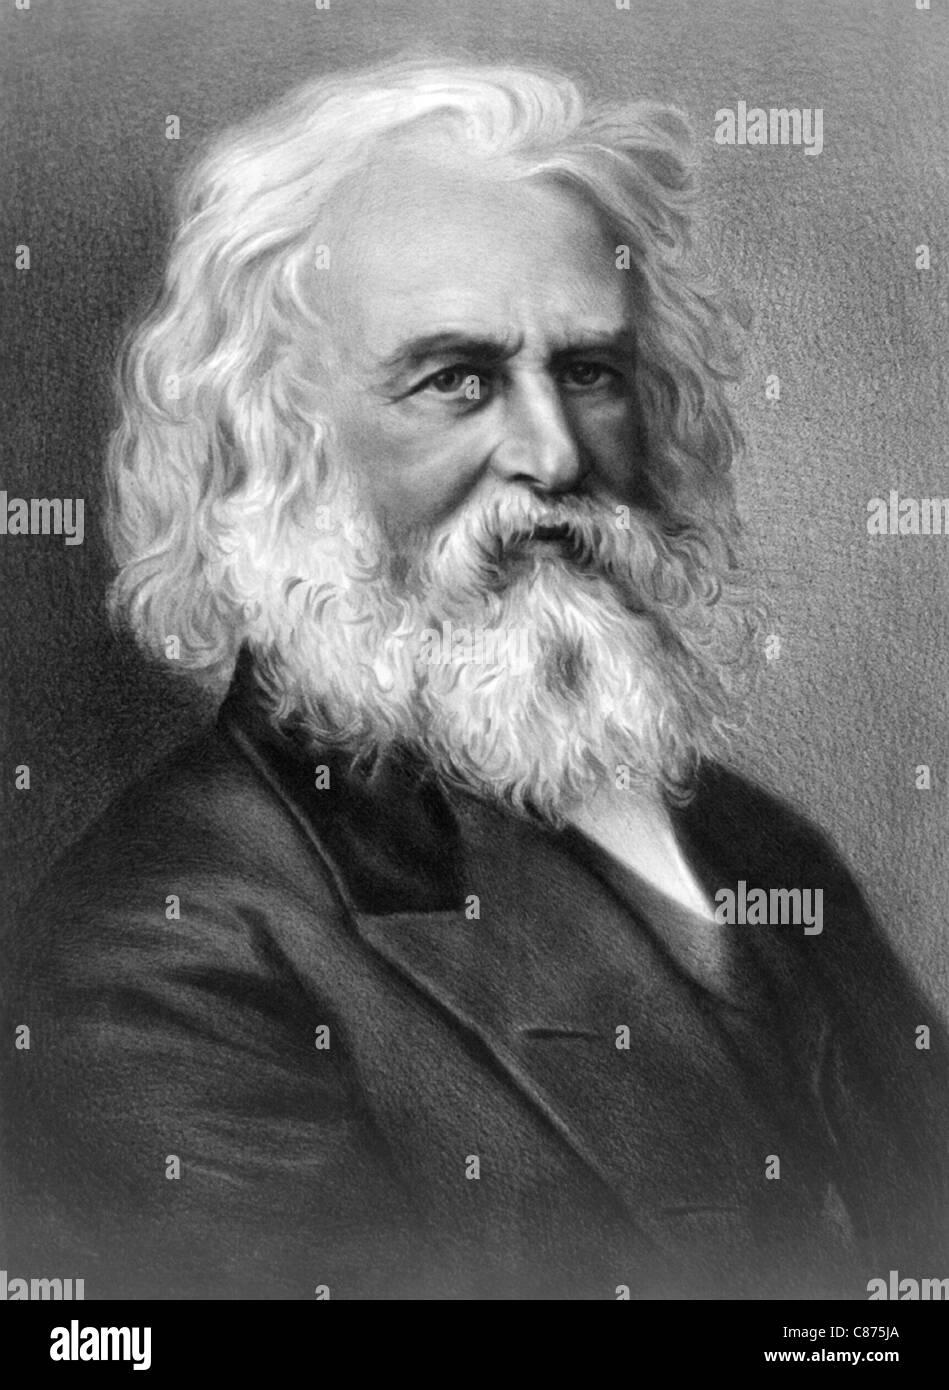 Vintage portrait of American poet and educator Henry Wadsworth Longfellow (1807 - 1882). Stock Photo